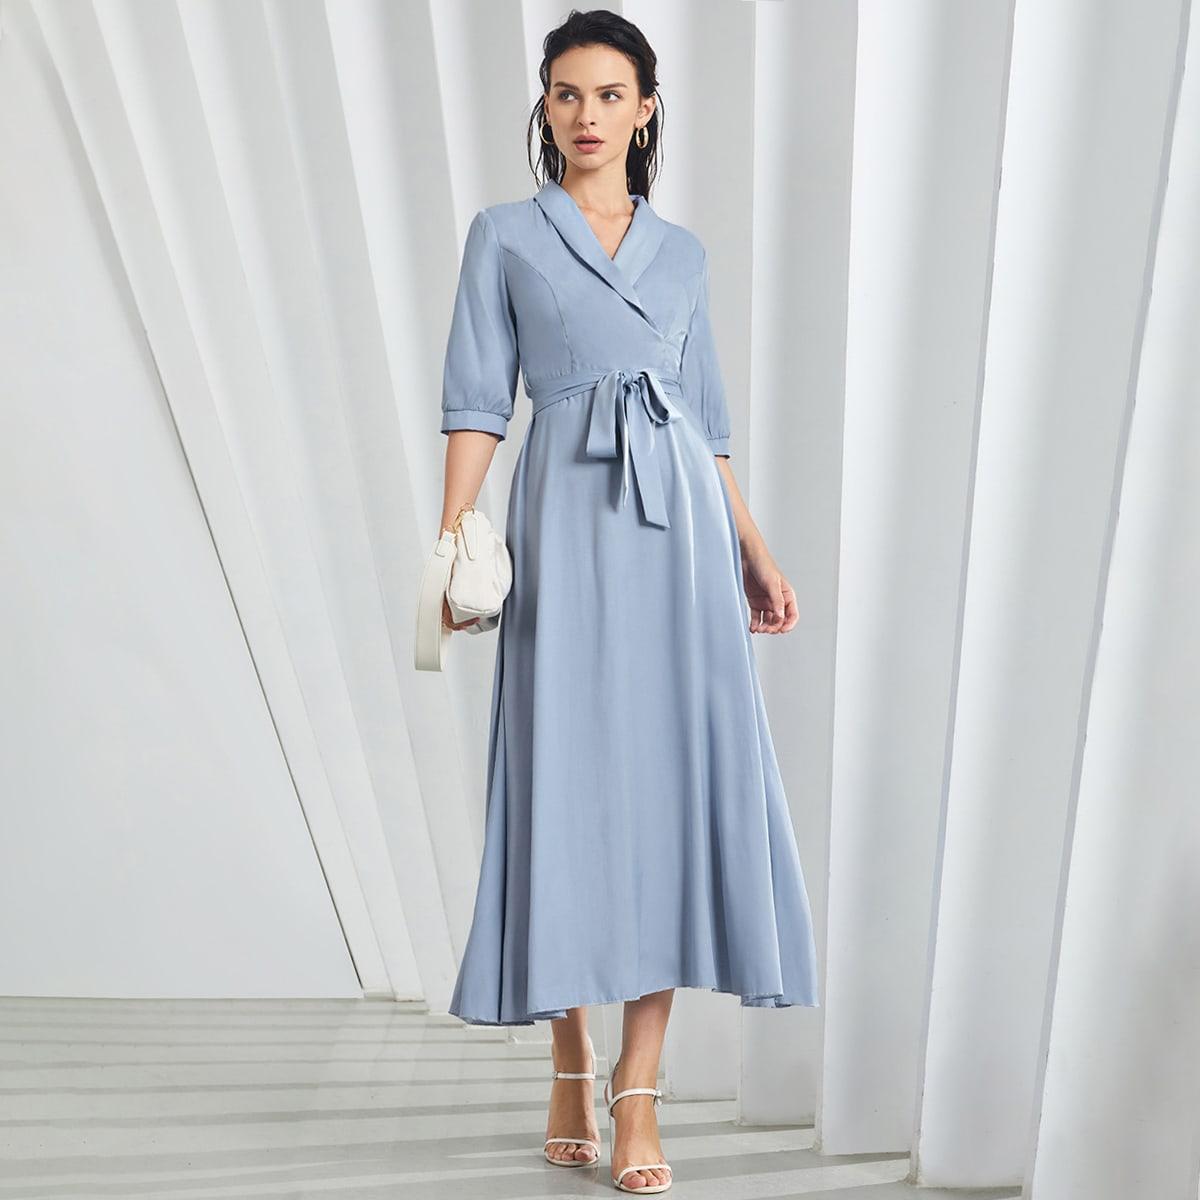 Shawl Collar Belted Shirt Dress